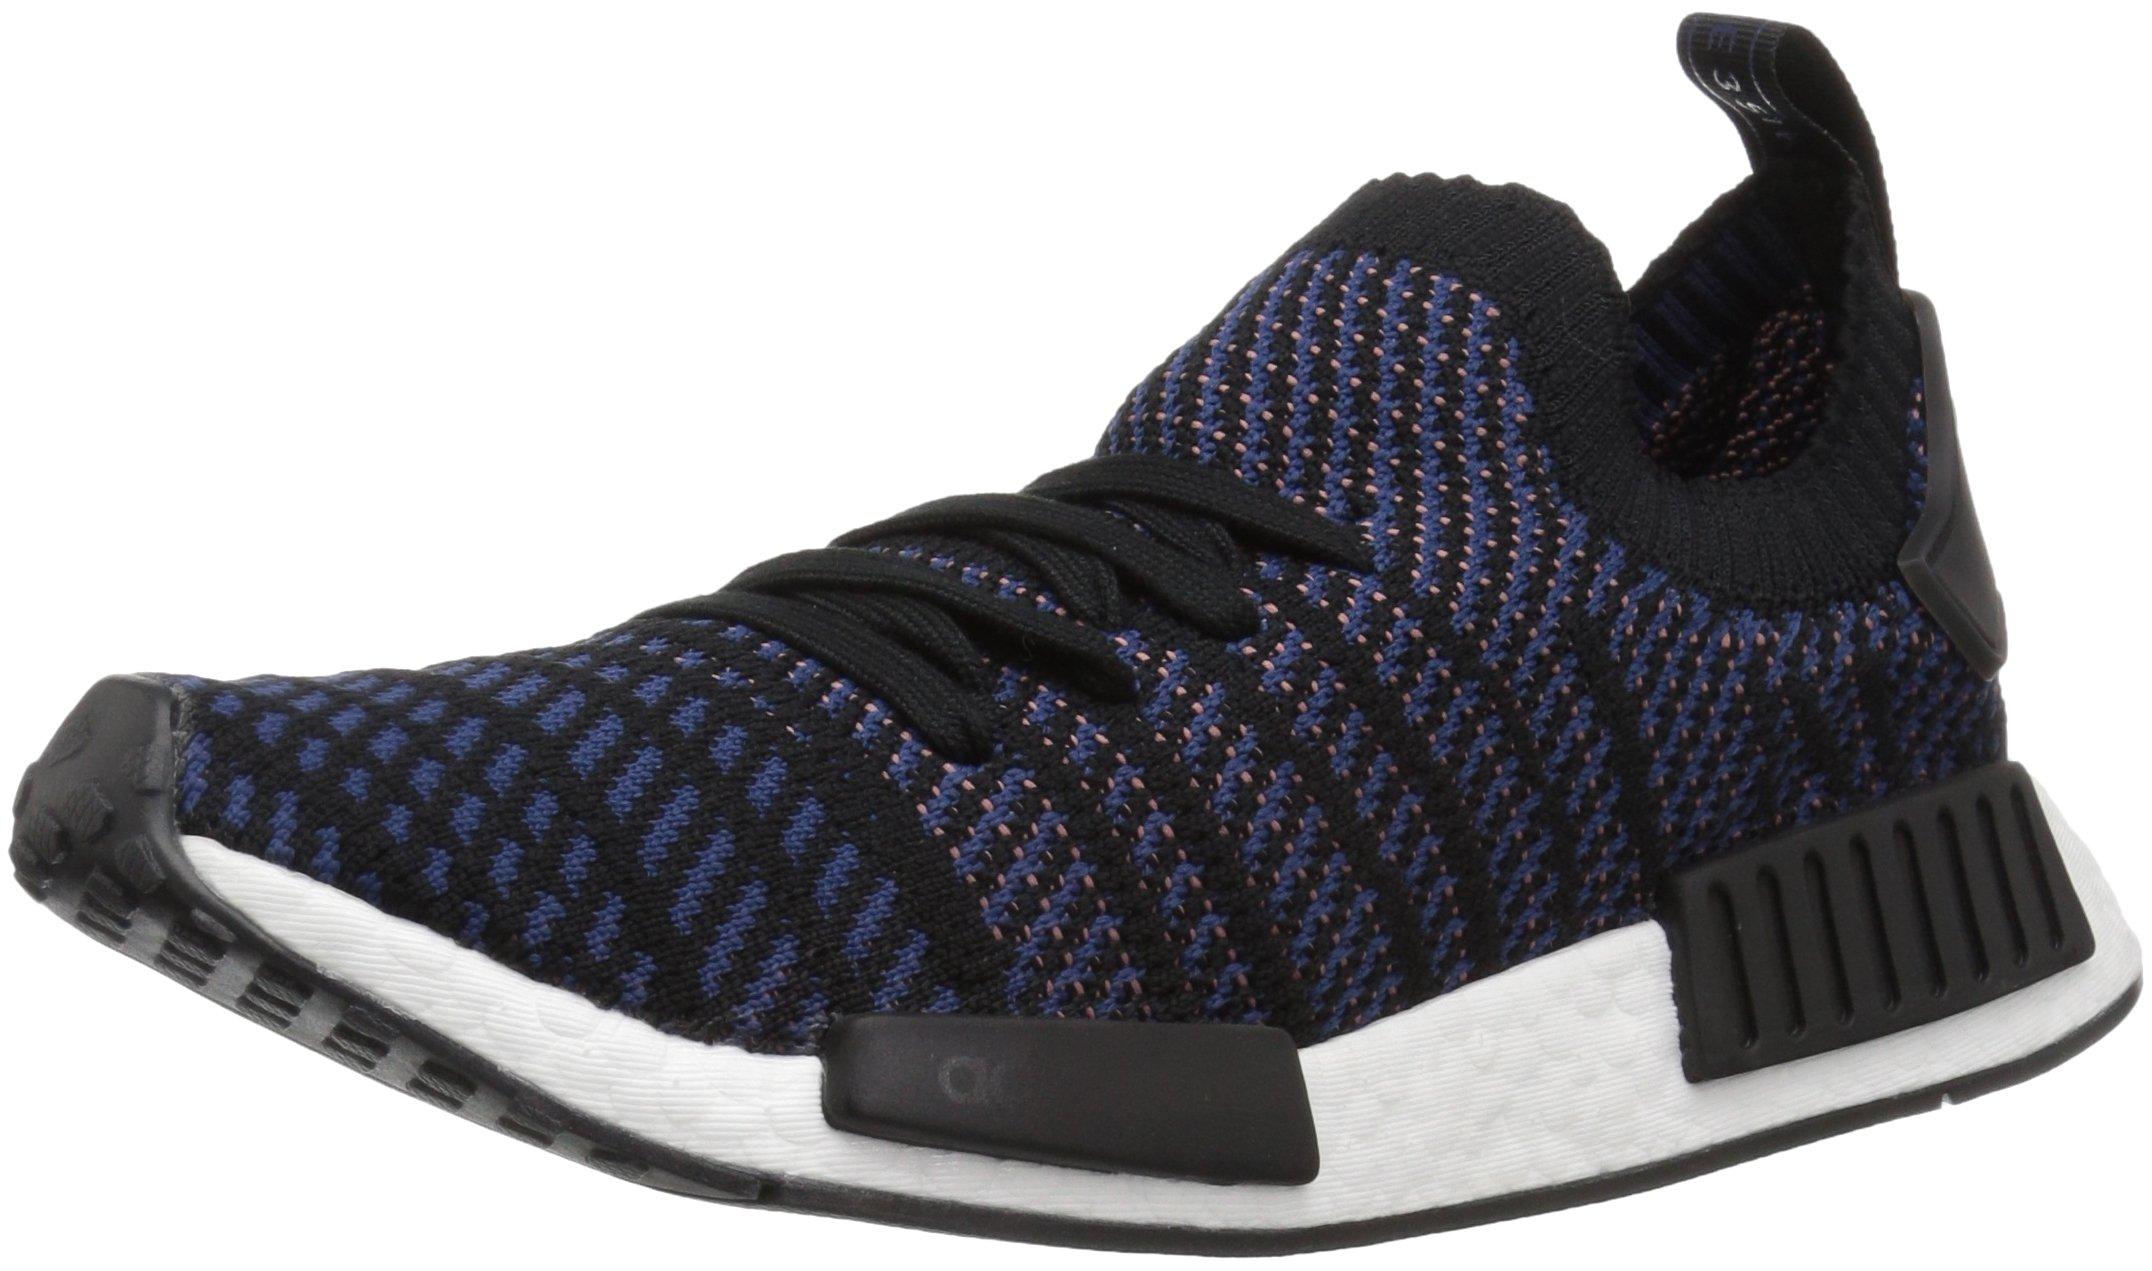 adidas Originals Women's NMD_R1 Stlt PK, Black/Ash Pink/Nobile Indigo, 6.5 M US